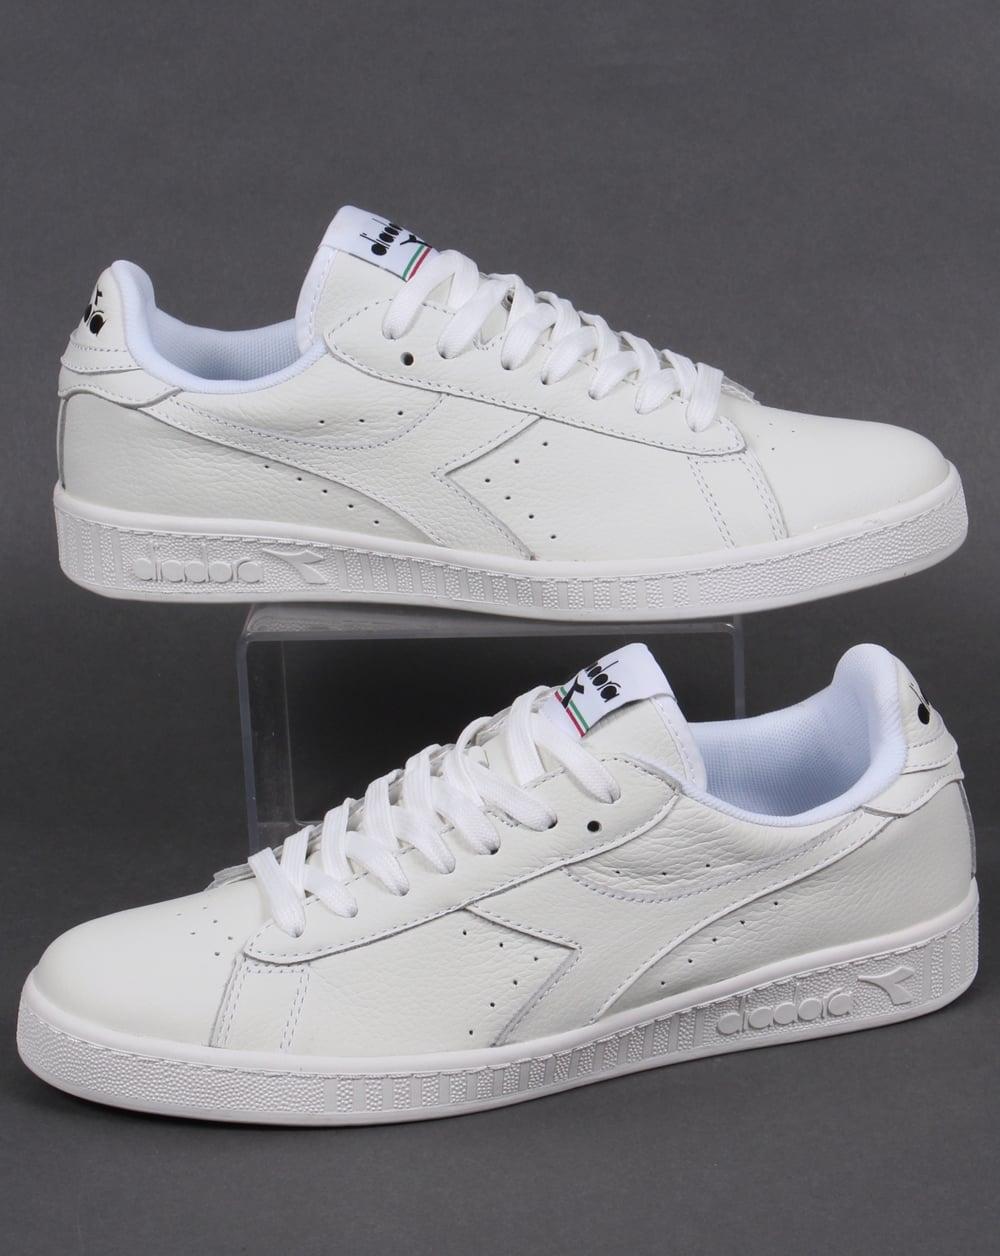 diadora white trainers shopping 72f13 b54e0